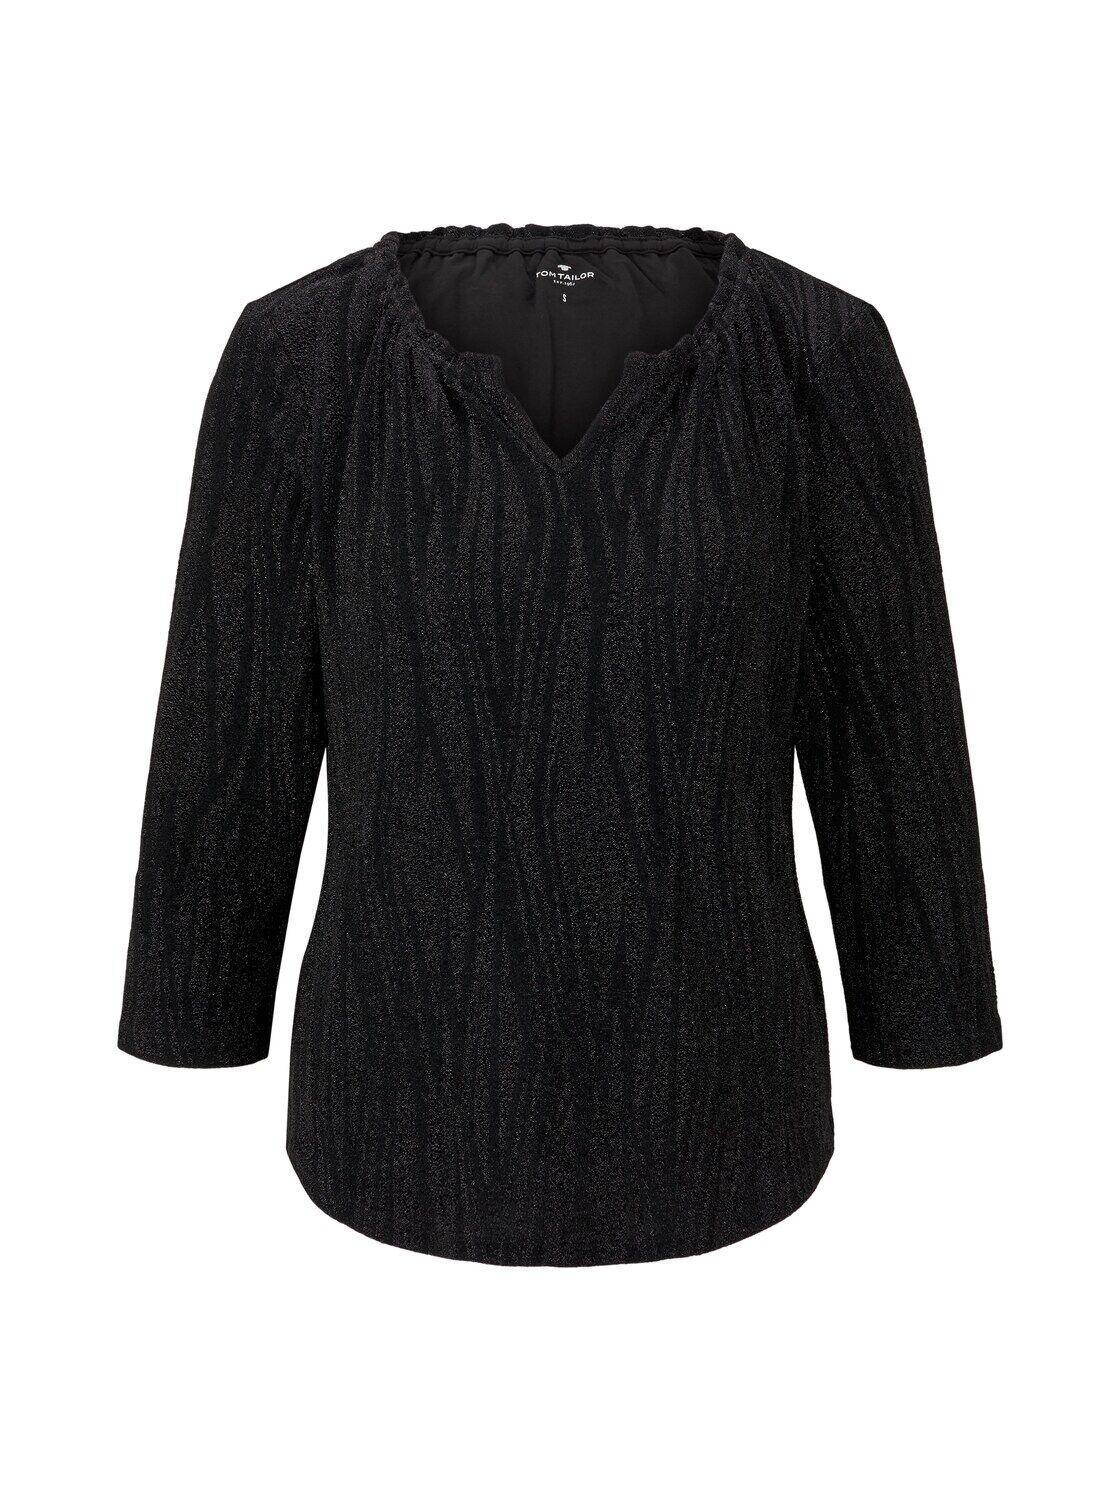 TOM TAILOR Damen Glitzer-Shirt in Crincle-Optik, schwarz, Gr.M